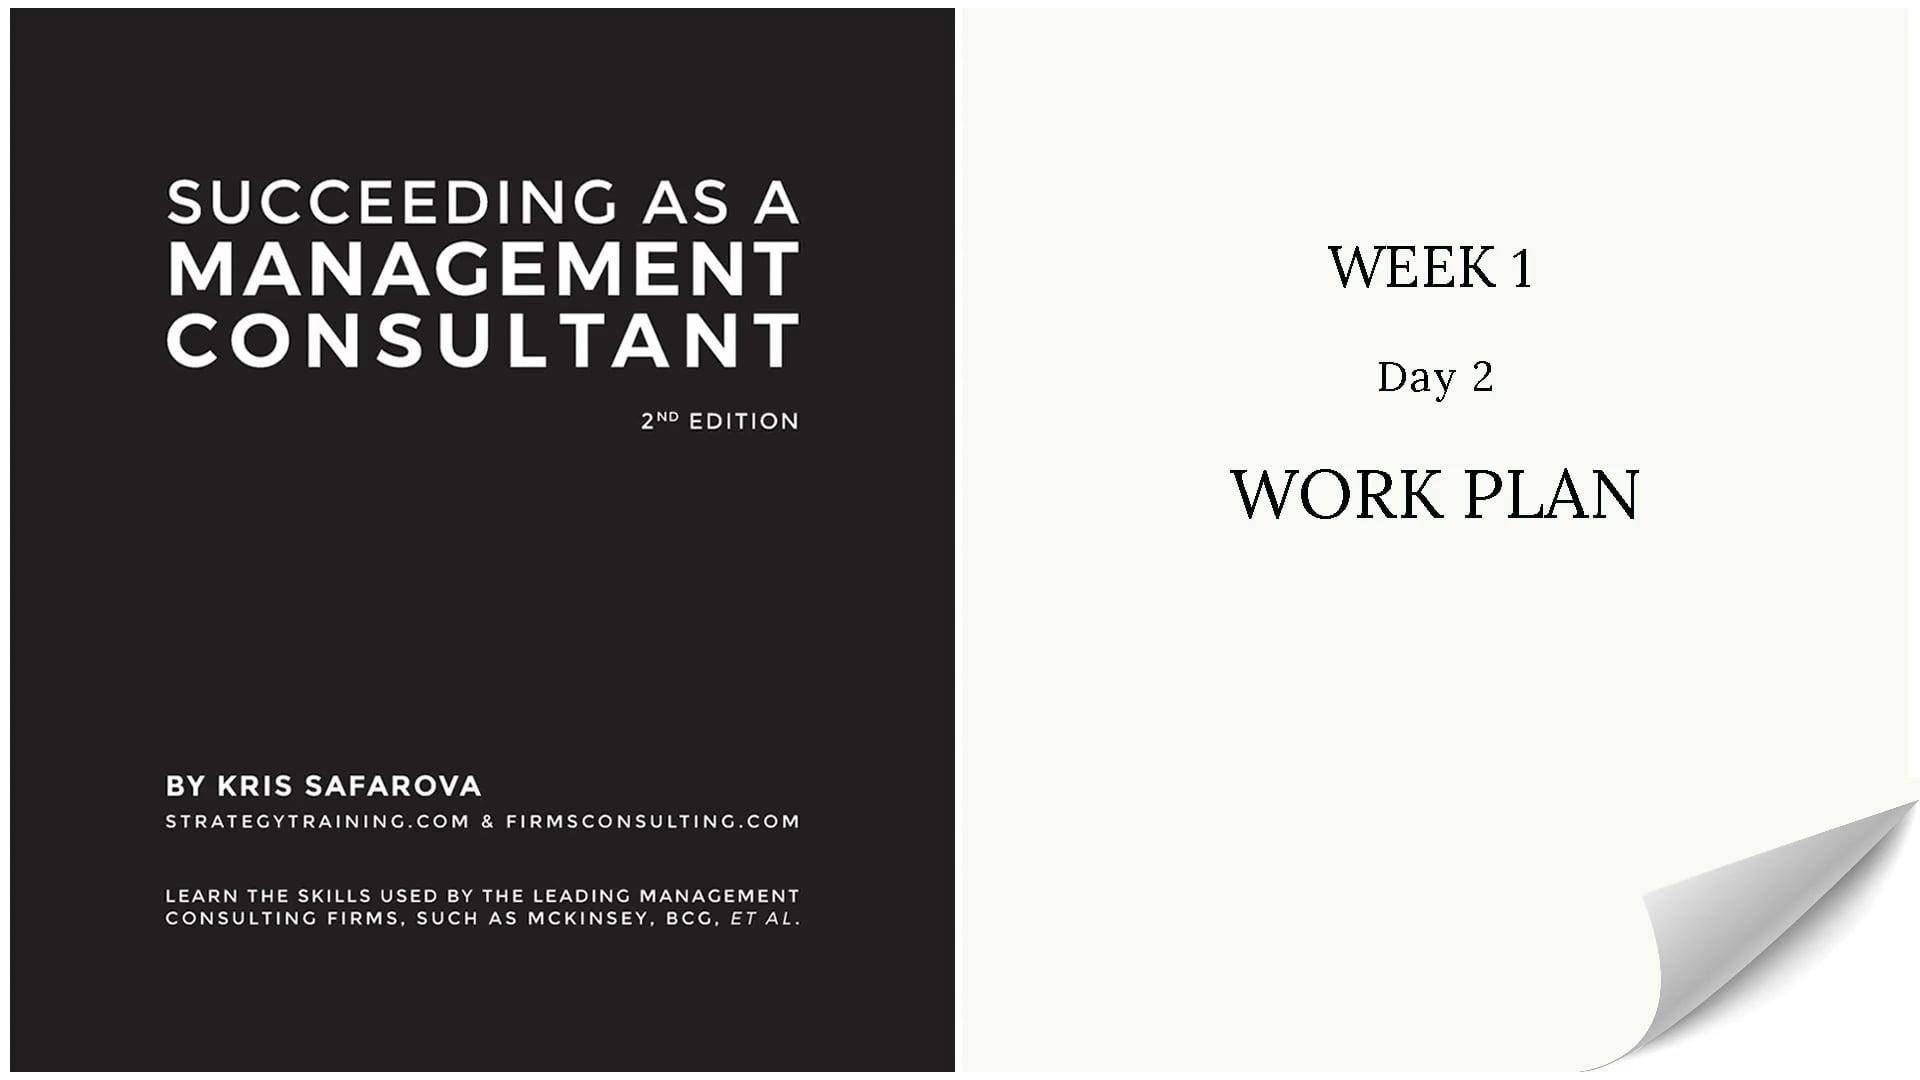 010 SAAMC Week 1 - Day 2 Work Plan